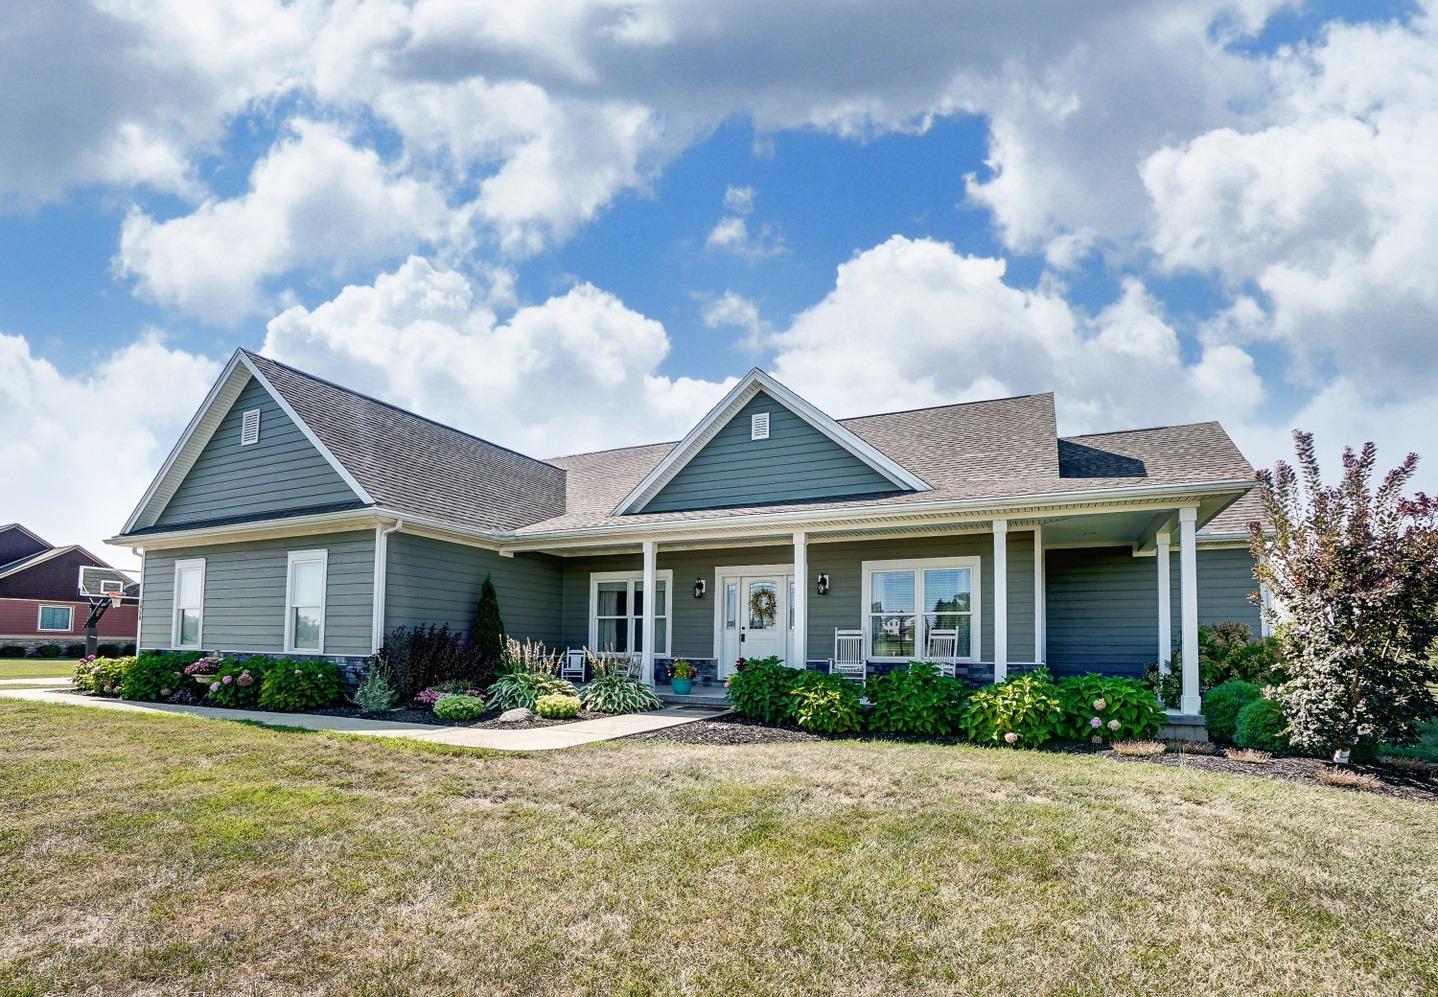 Property for sale at 1950 Fiesta Drive, Turtle Creek Twp,  Ohio 45036